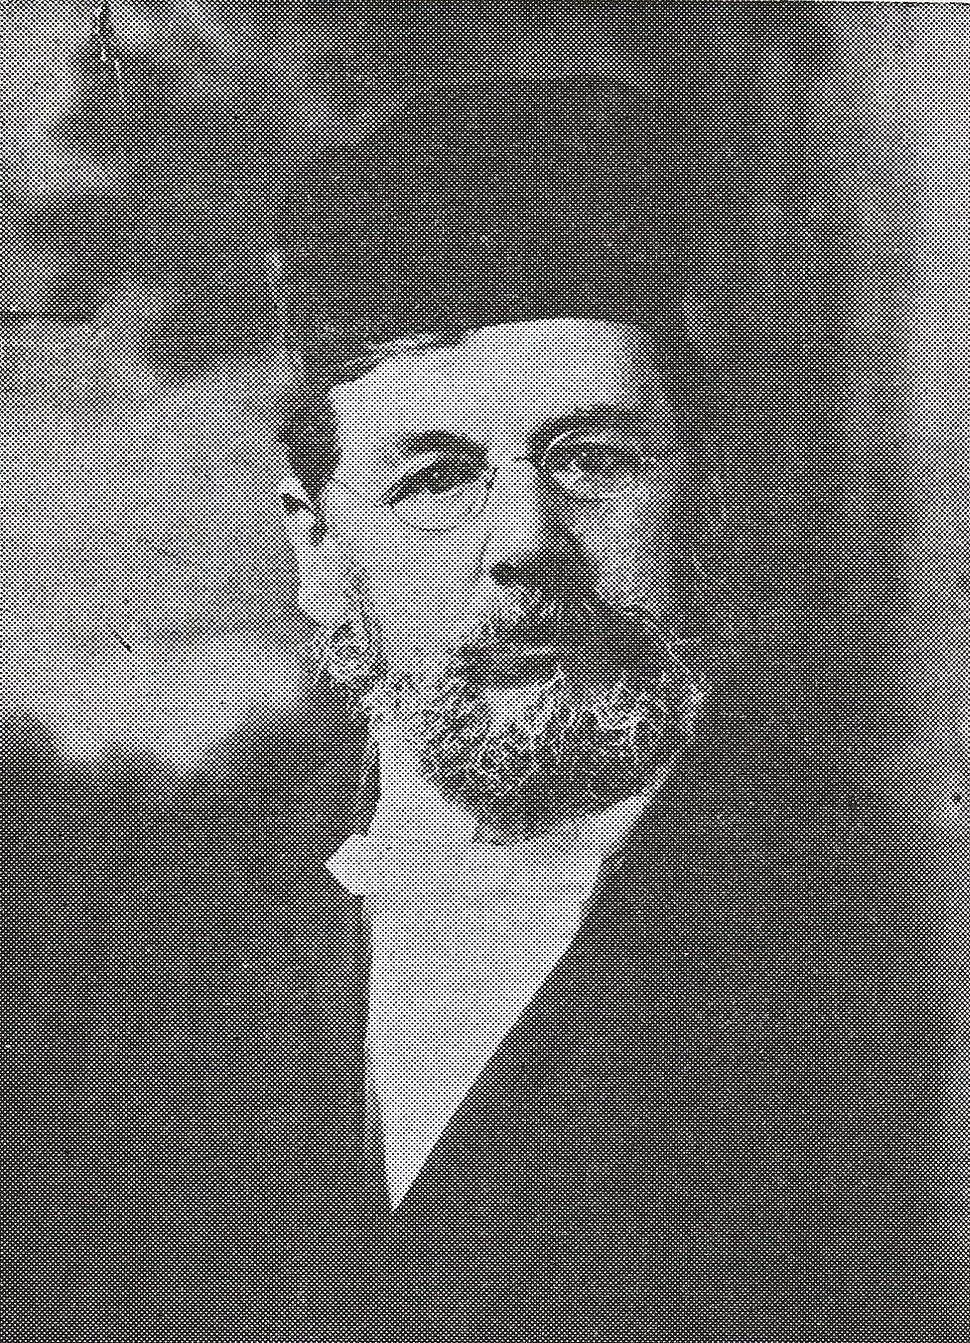 Shimon Siwitz